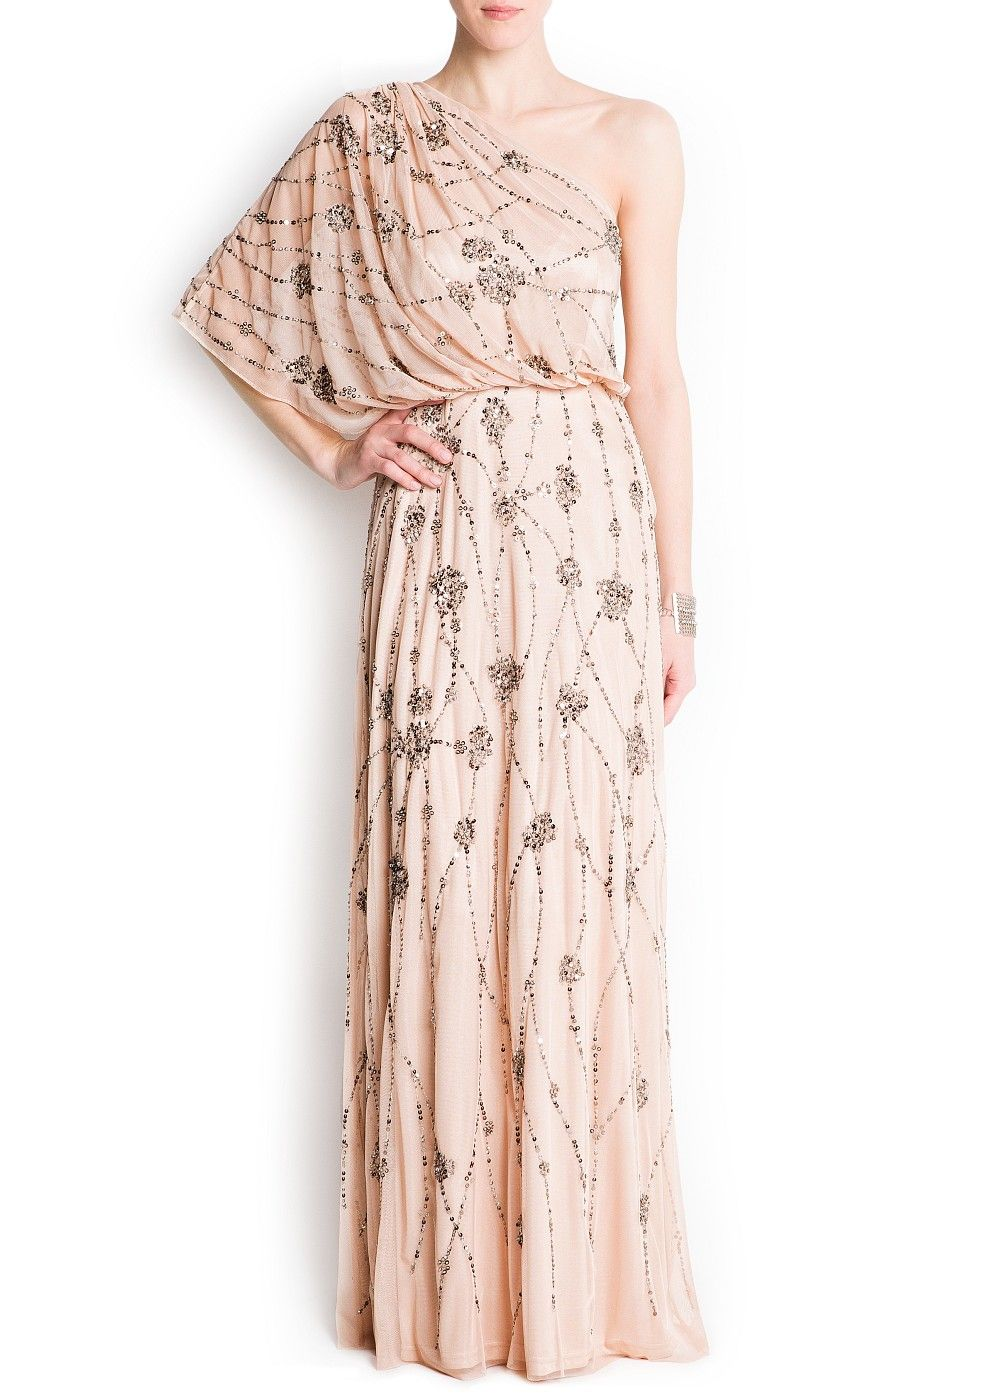 MANGO SS13  Vestido tul bordado  129,99€  Ref. 83423552 Weding